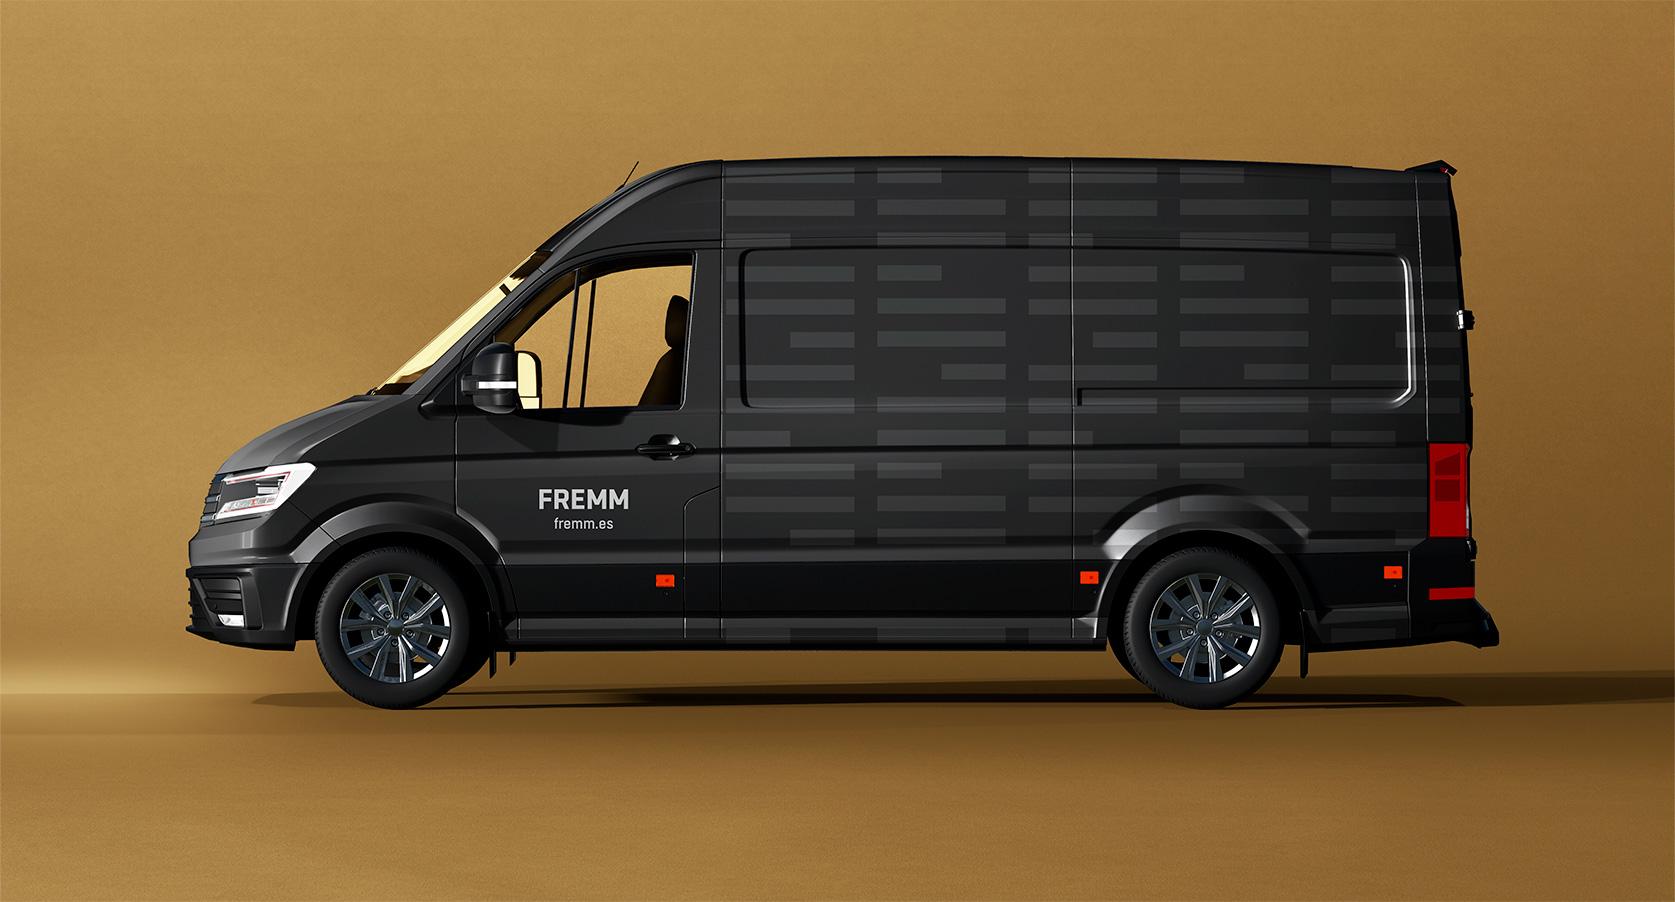 Fremm-branding-02